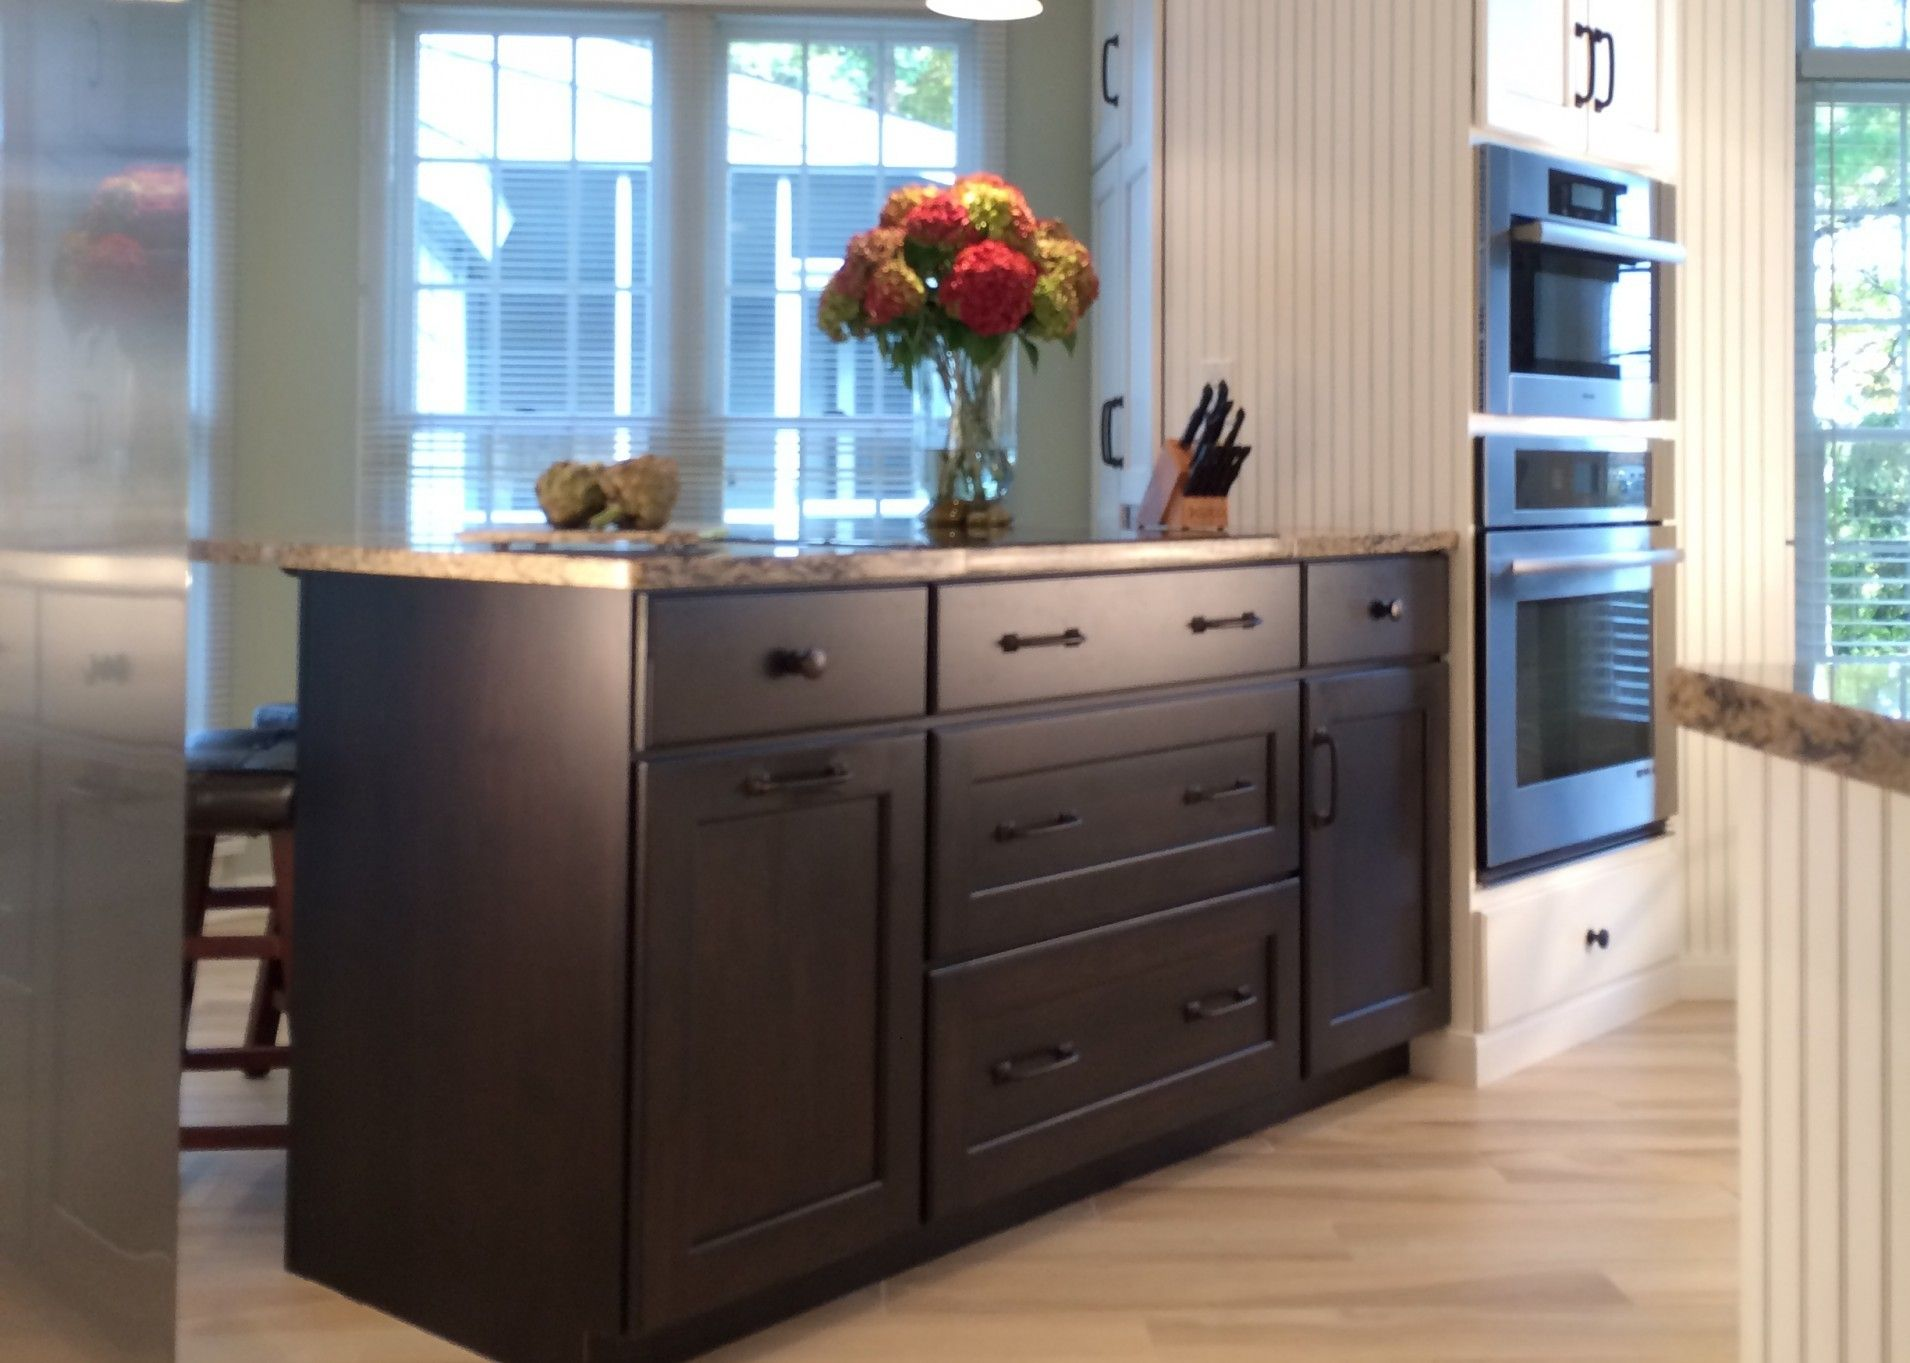 Media Gallery Holiday Kitchen Kitchen Kitchen Cabinets